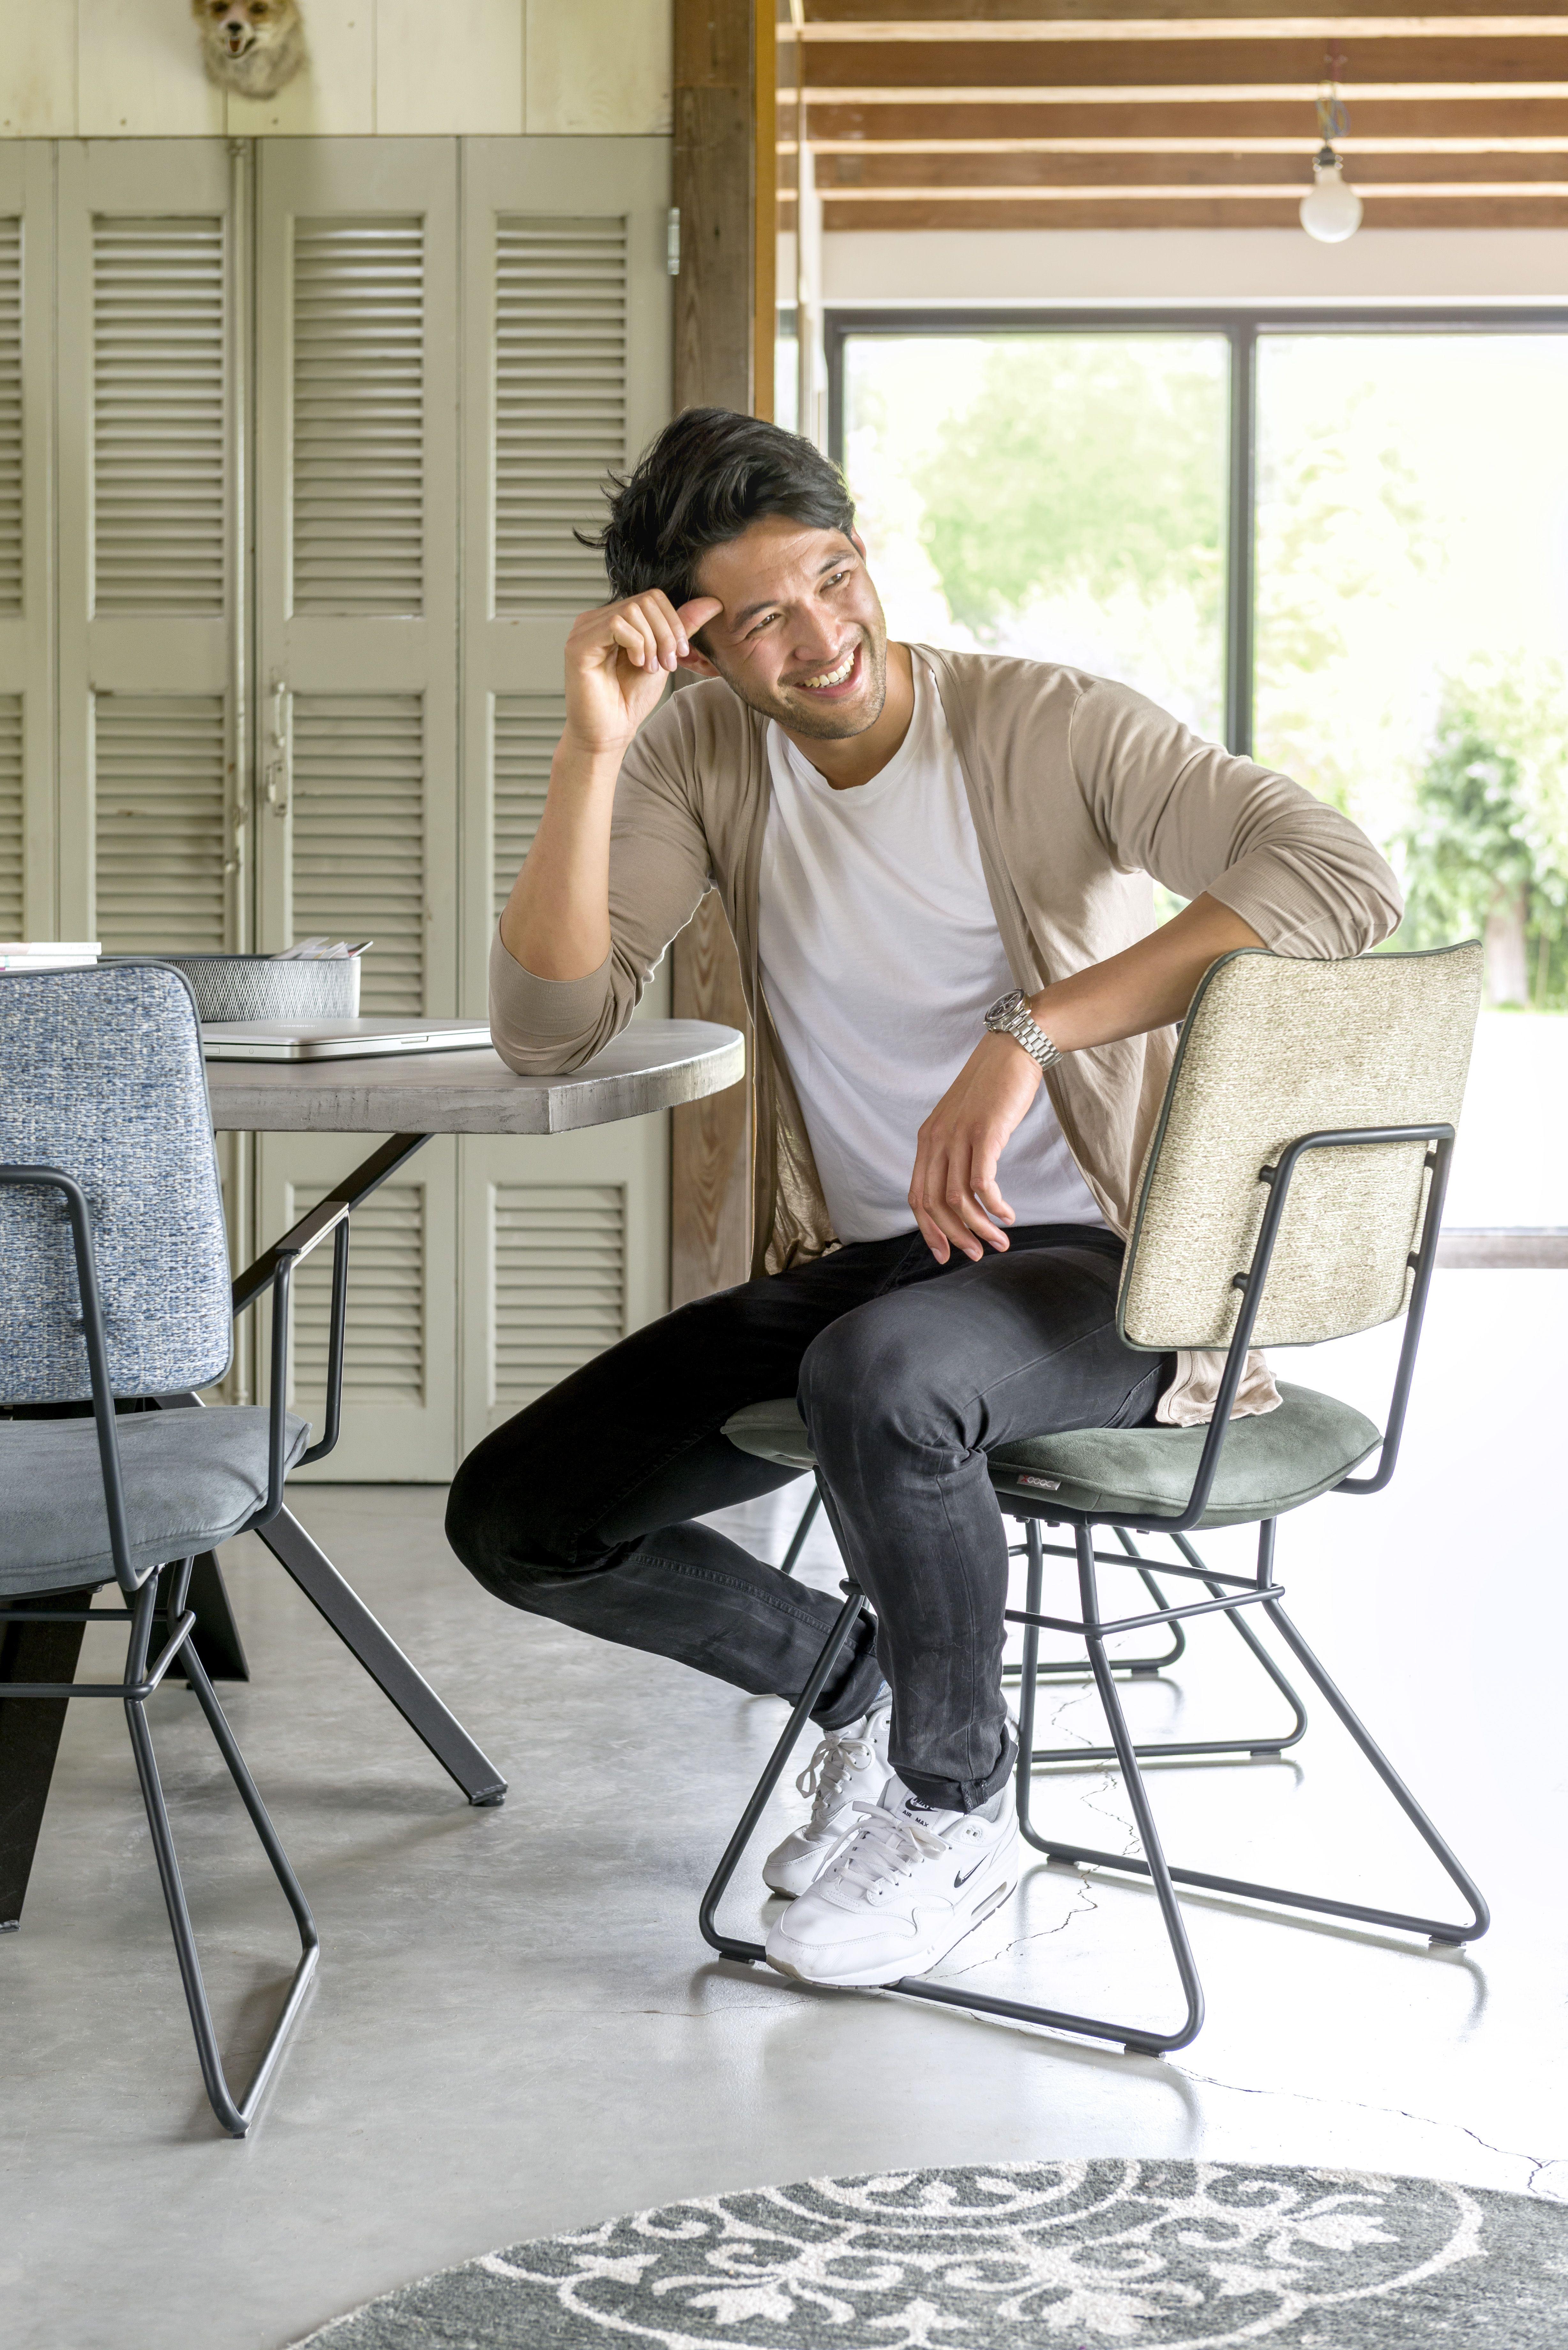 Xooon Otis Design Interior Xooon Otis En 2020 Chaise De Salle A Manger Design Salle A Manger